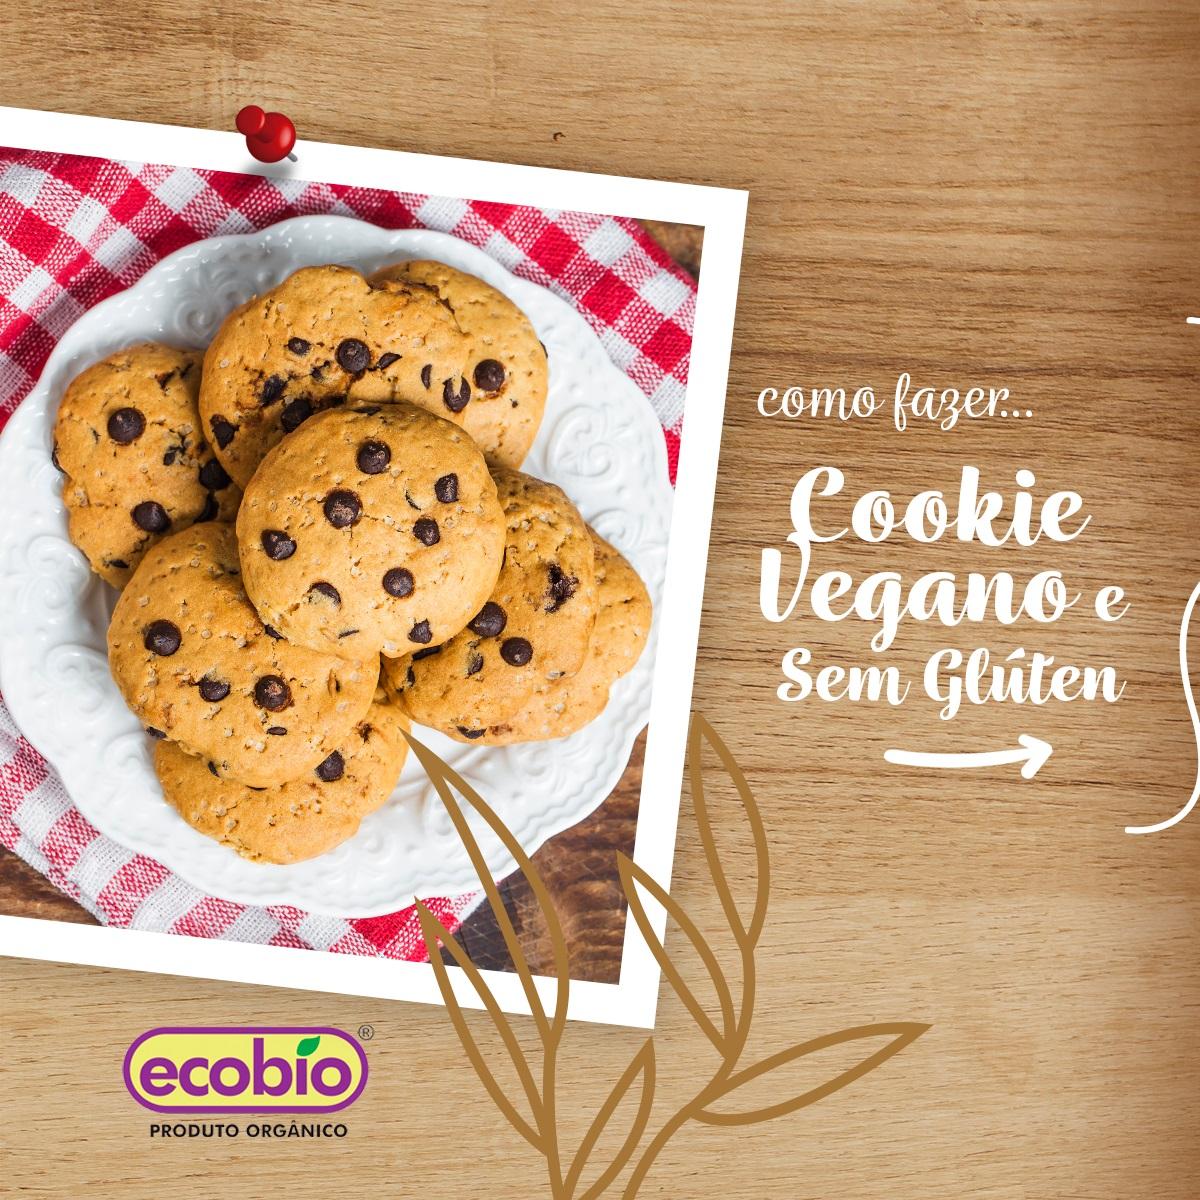 Cookie  Vegano e  Sem Glúten